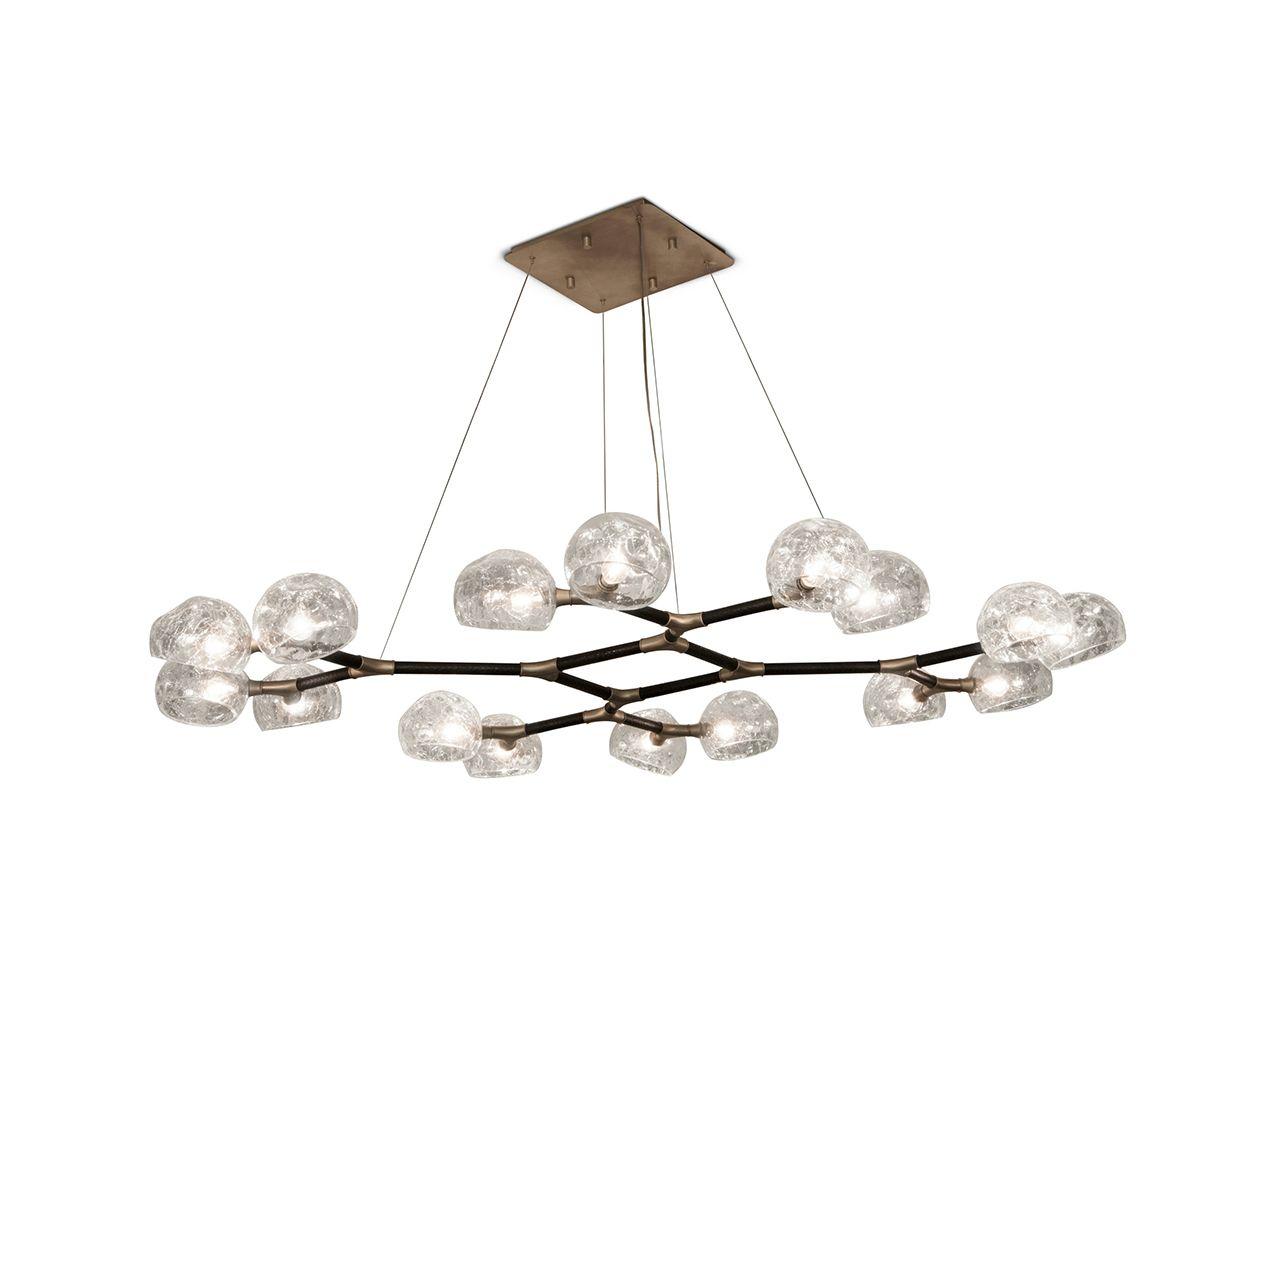 suspension lamps Suspension Lamps: 22 Ideas To Transform Your Design Into Art 19 6